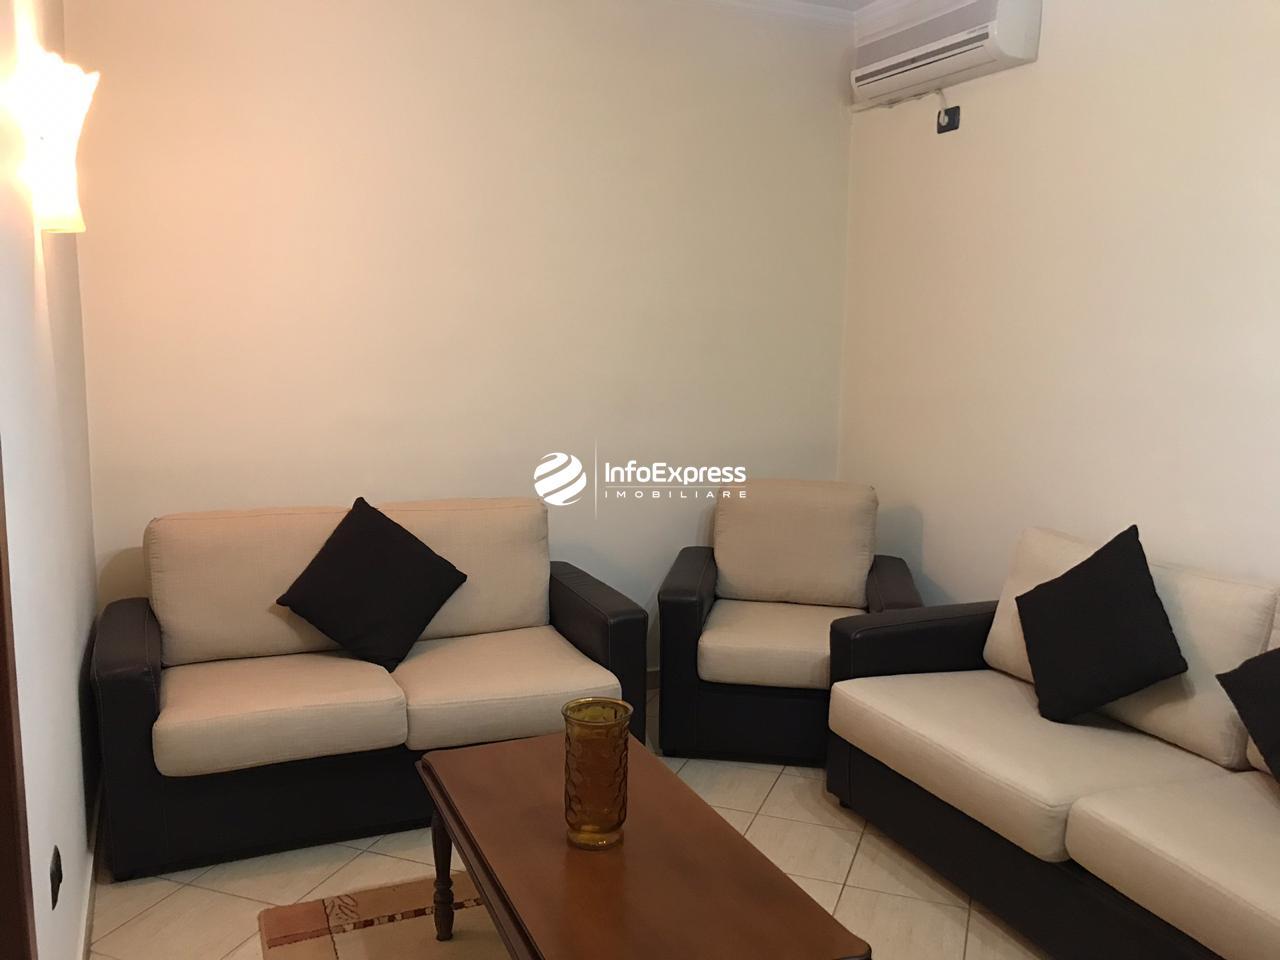 TRR-0419-1394 Jepet me qera apartament ne rrugen Myslym Shyri